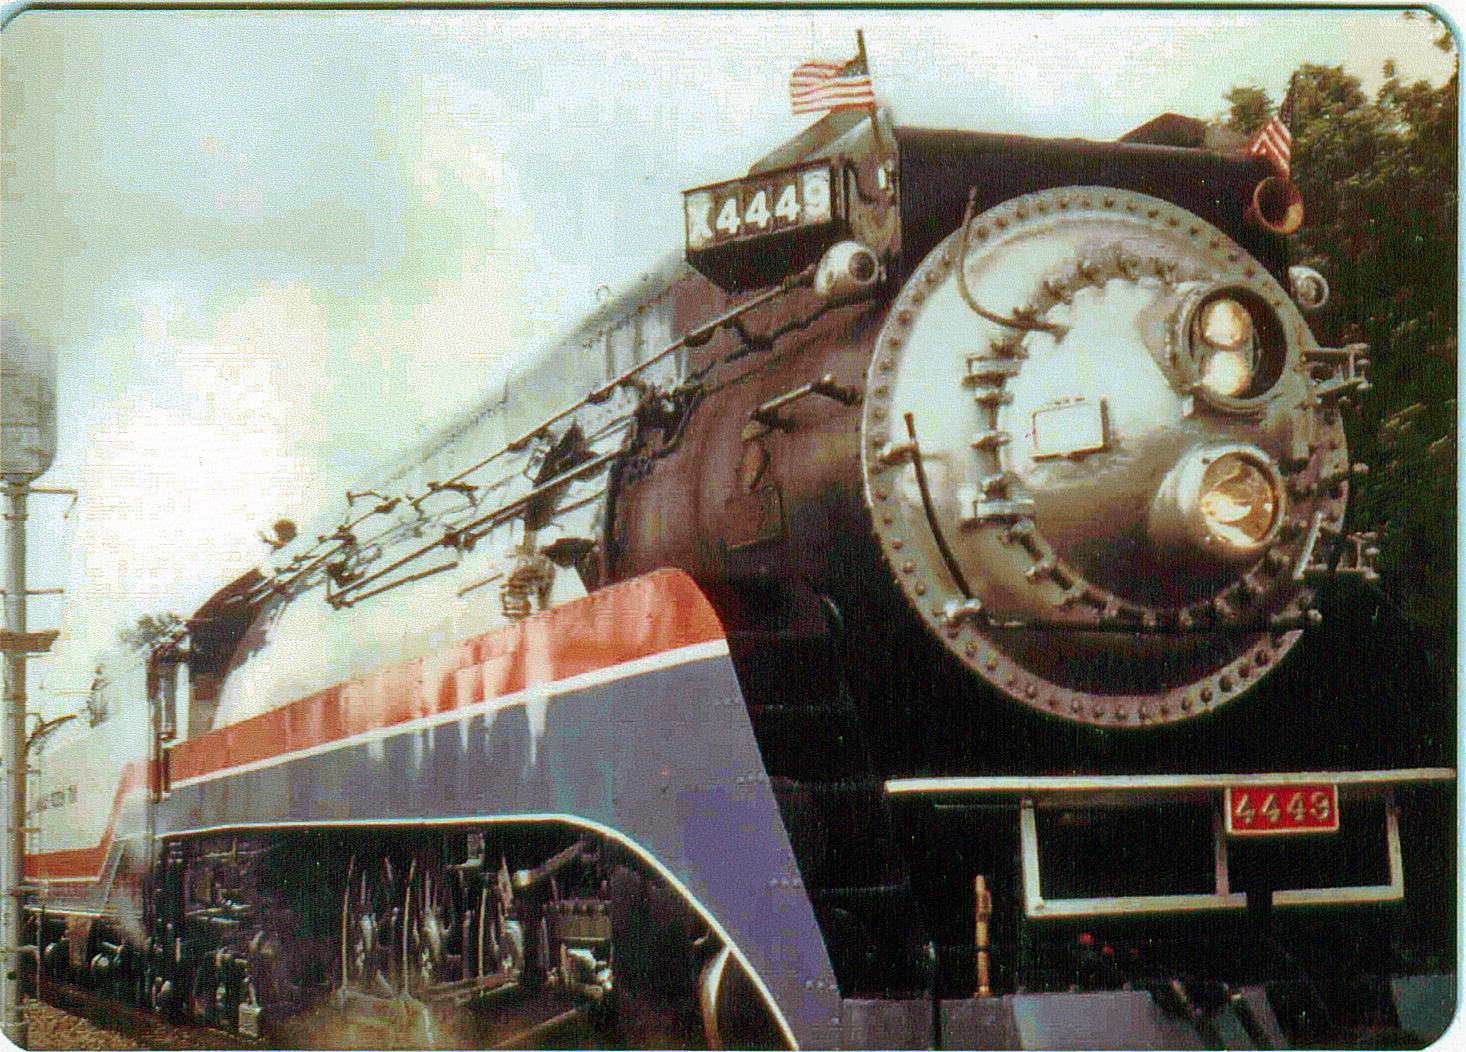 american freedom train 1976 - photo #26